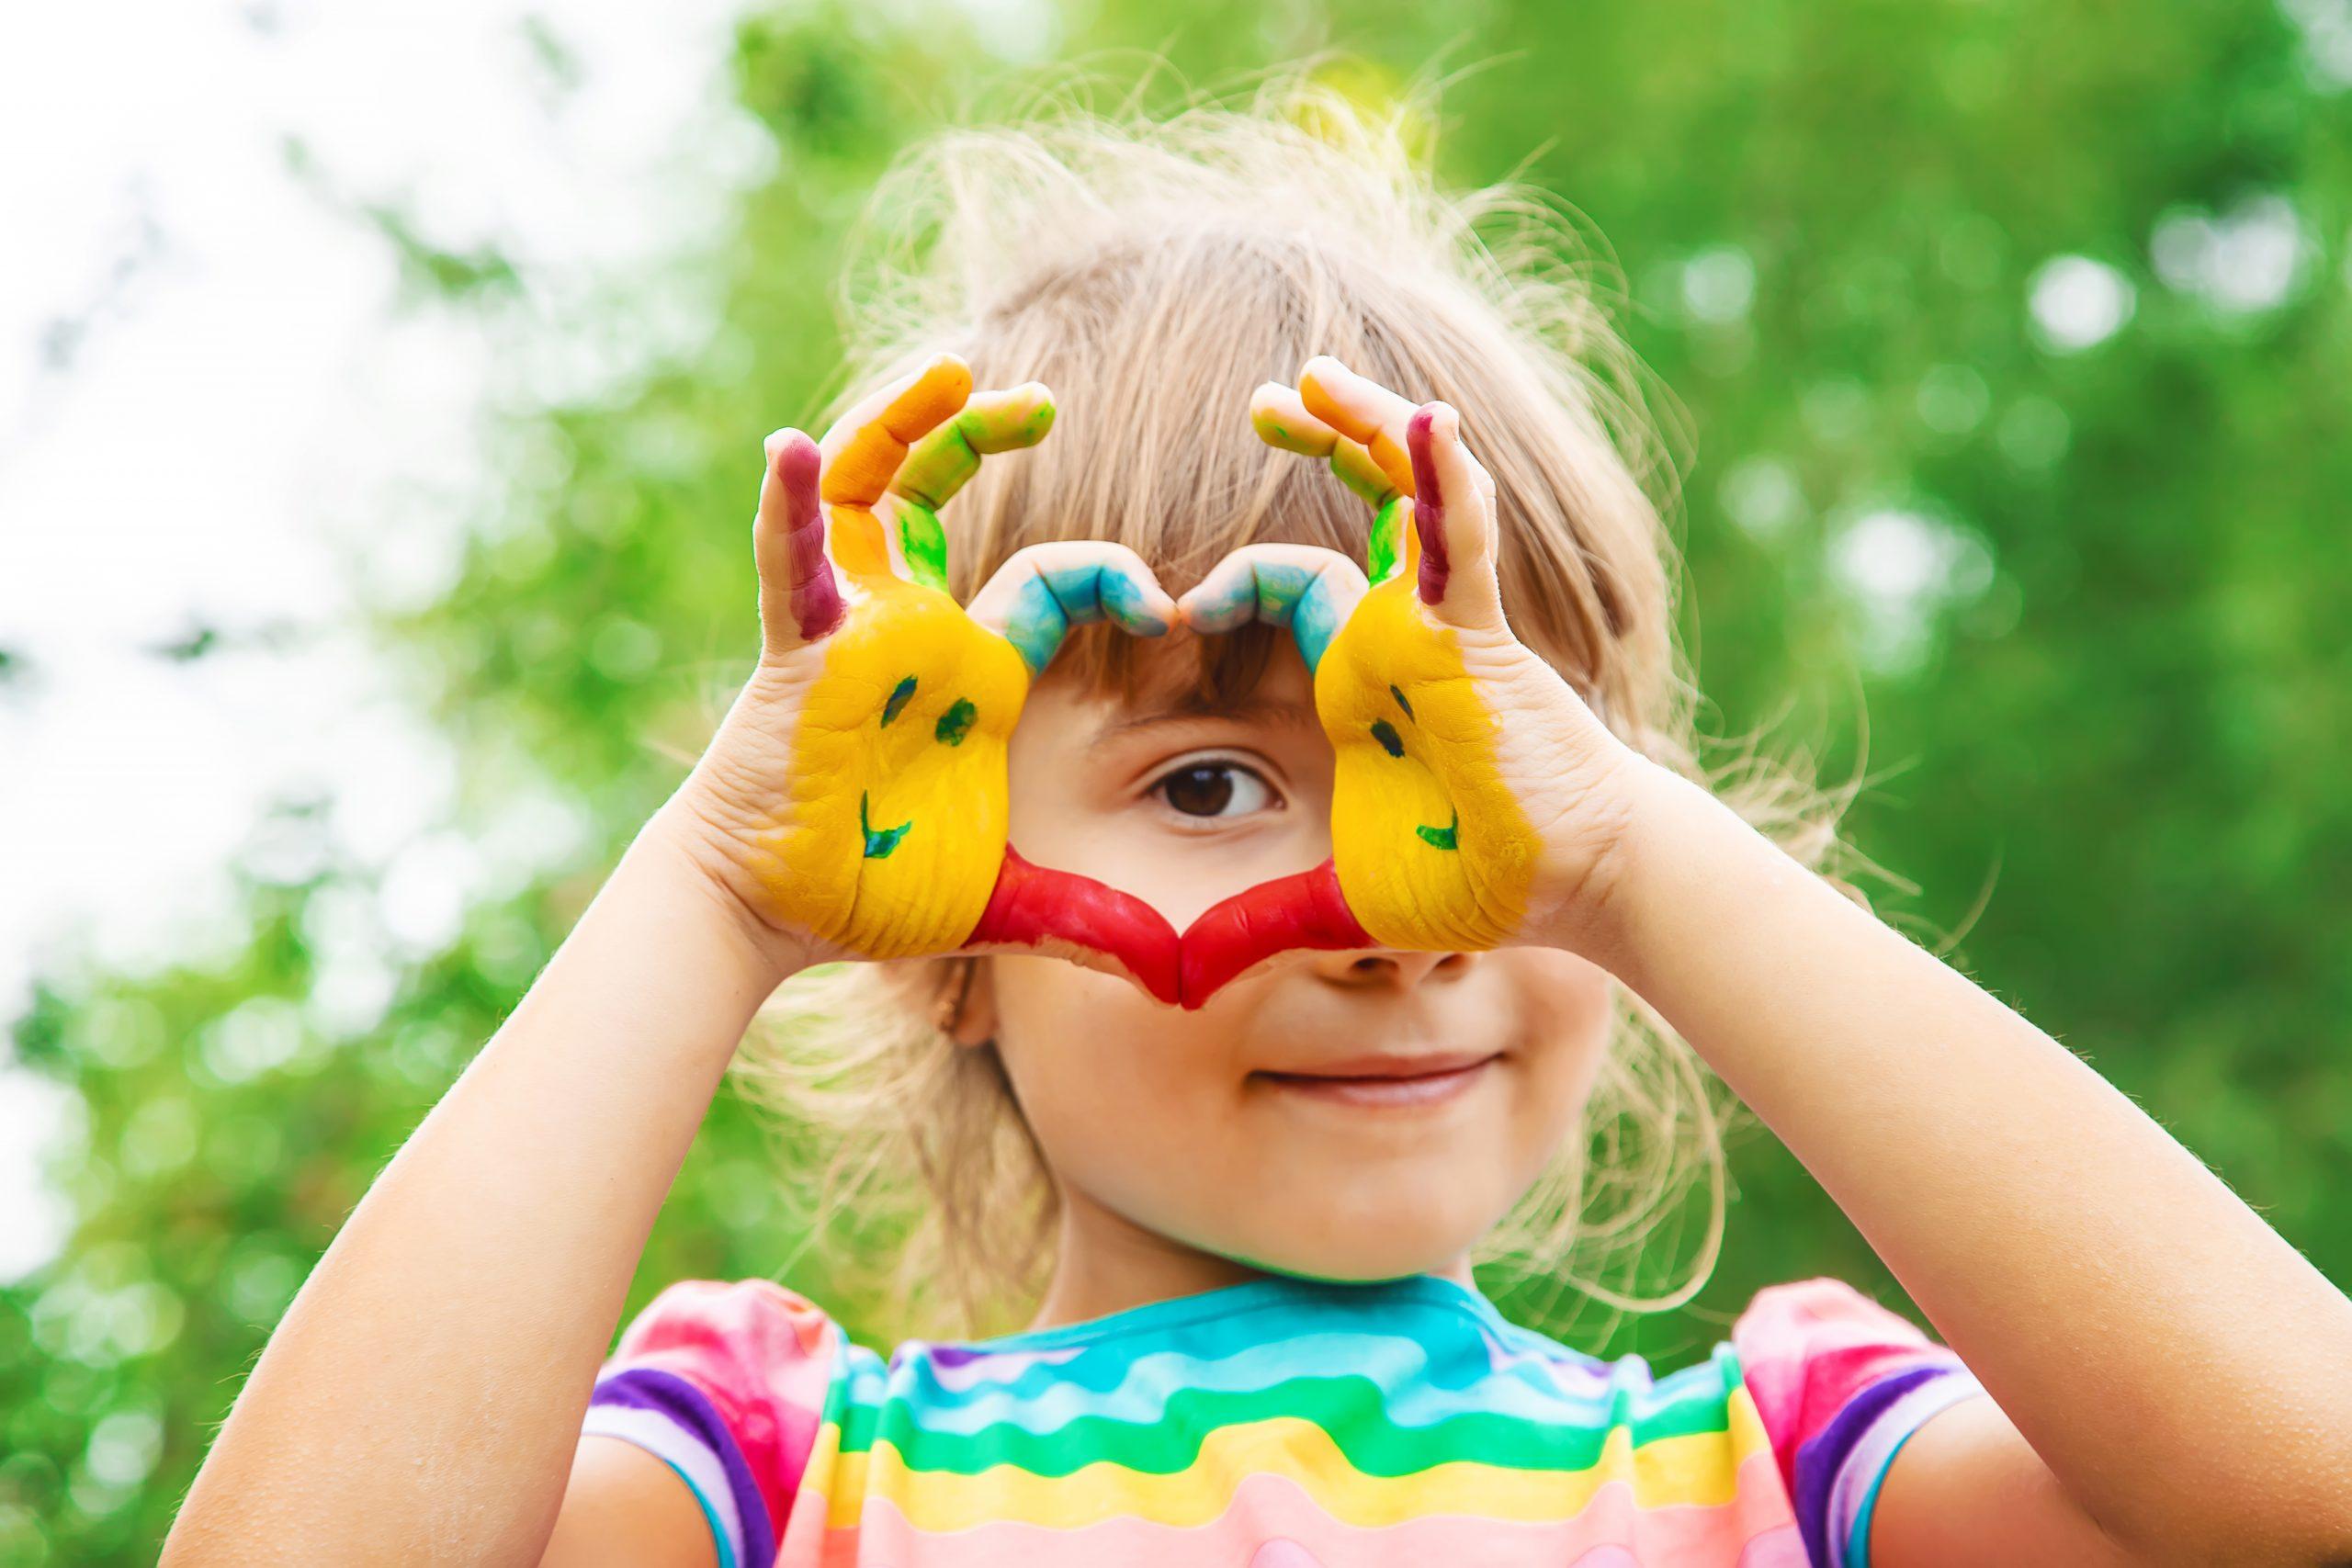 children hands in colors. Summer photo. Selective focus. nature